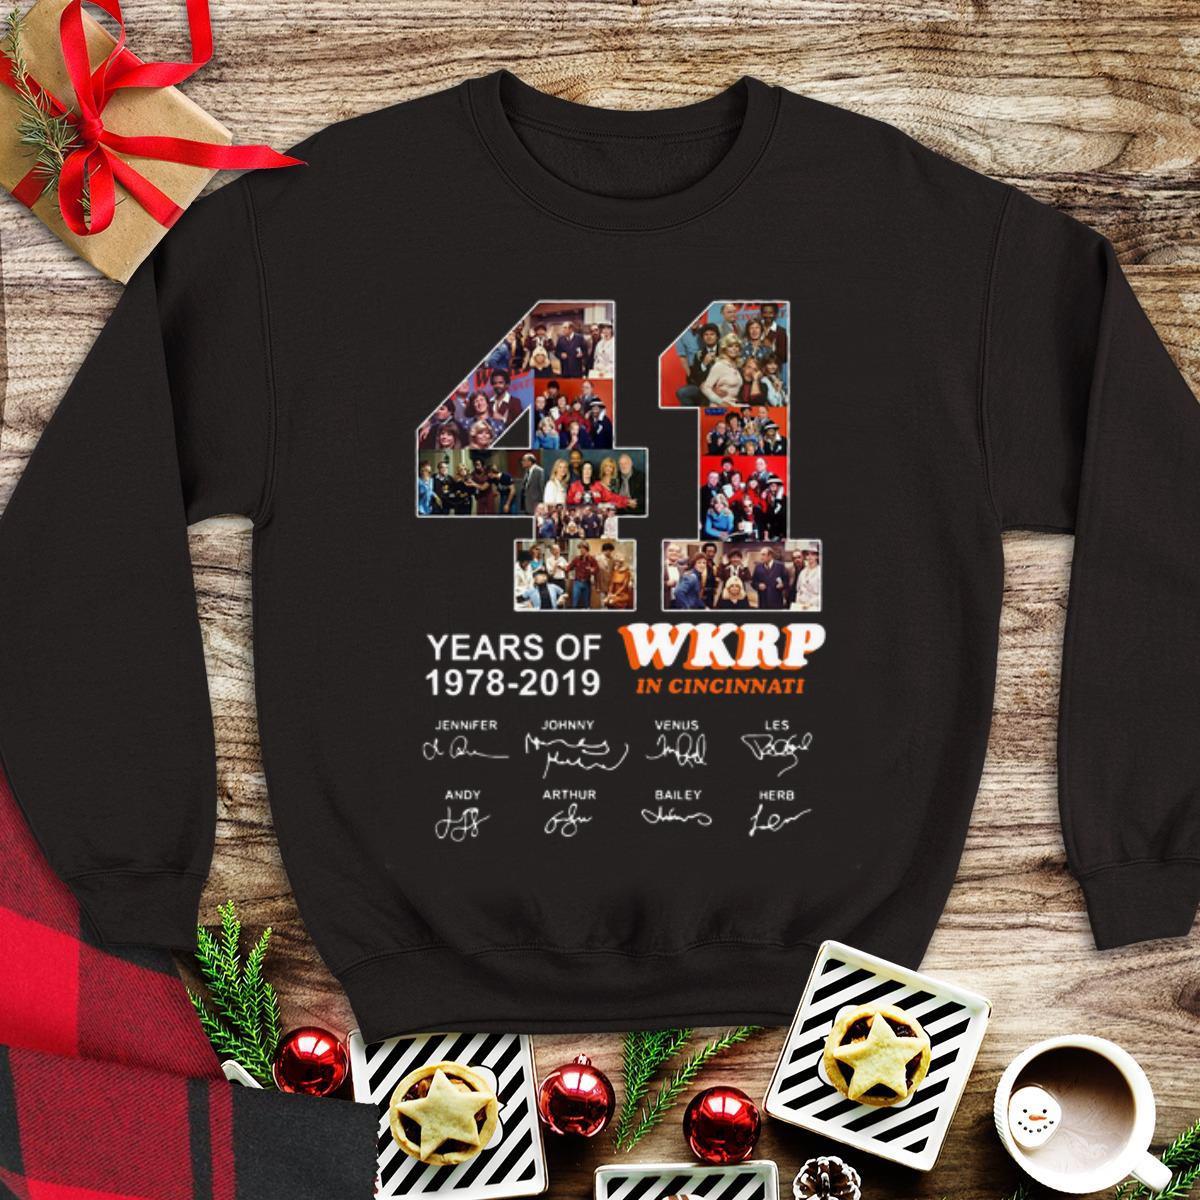 Awesome 41 Years Of Wkrp In Cincinnati 1978 2019 Signature Shirt 1 1.jpg